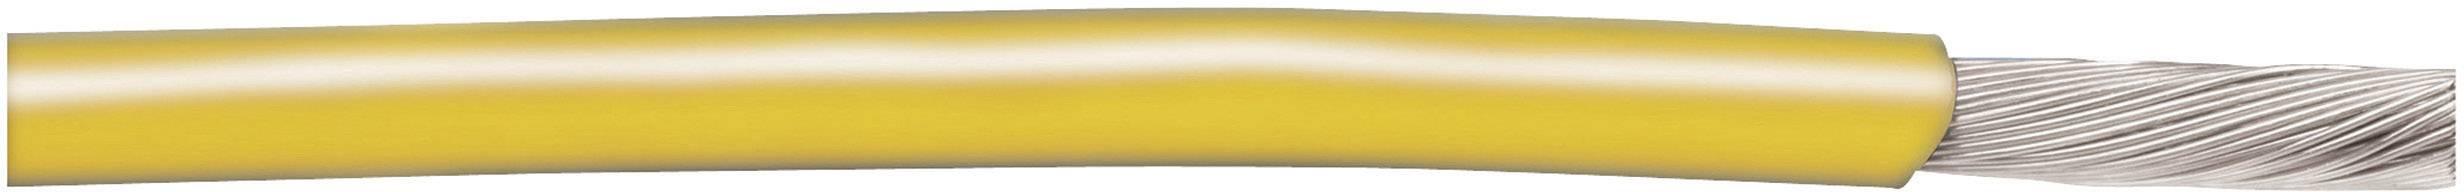 Opletenie / lanko AlphaWire 3055-005-YEL 1 x 0.82 mm², vonkajší Ø 2 mm, 30.5 m, žltá